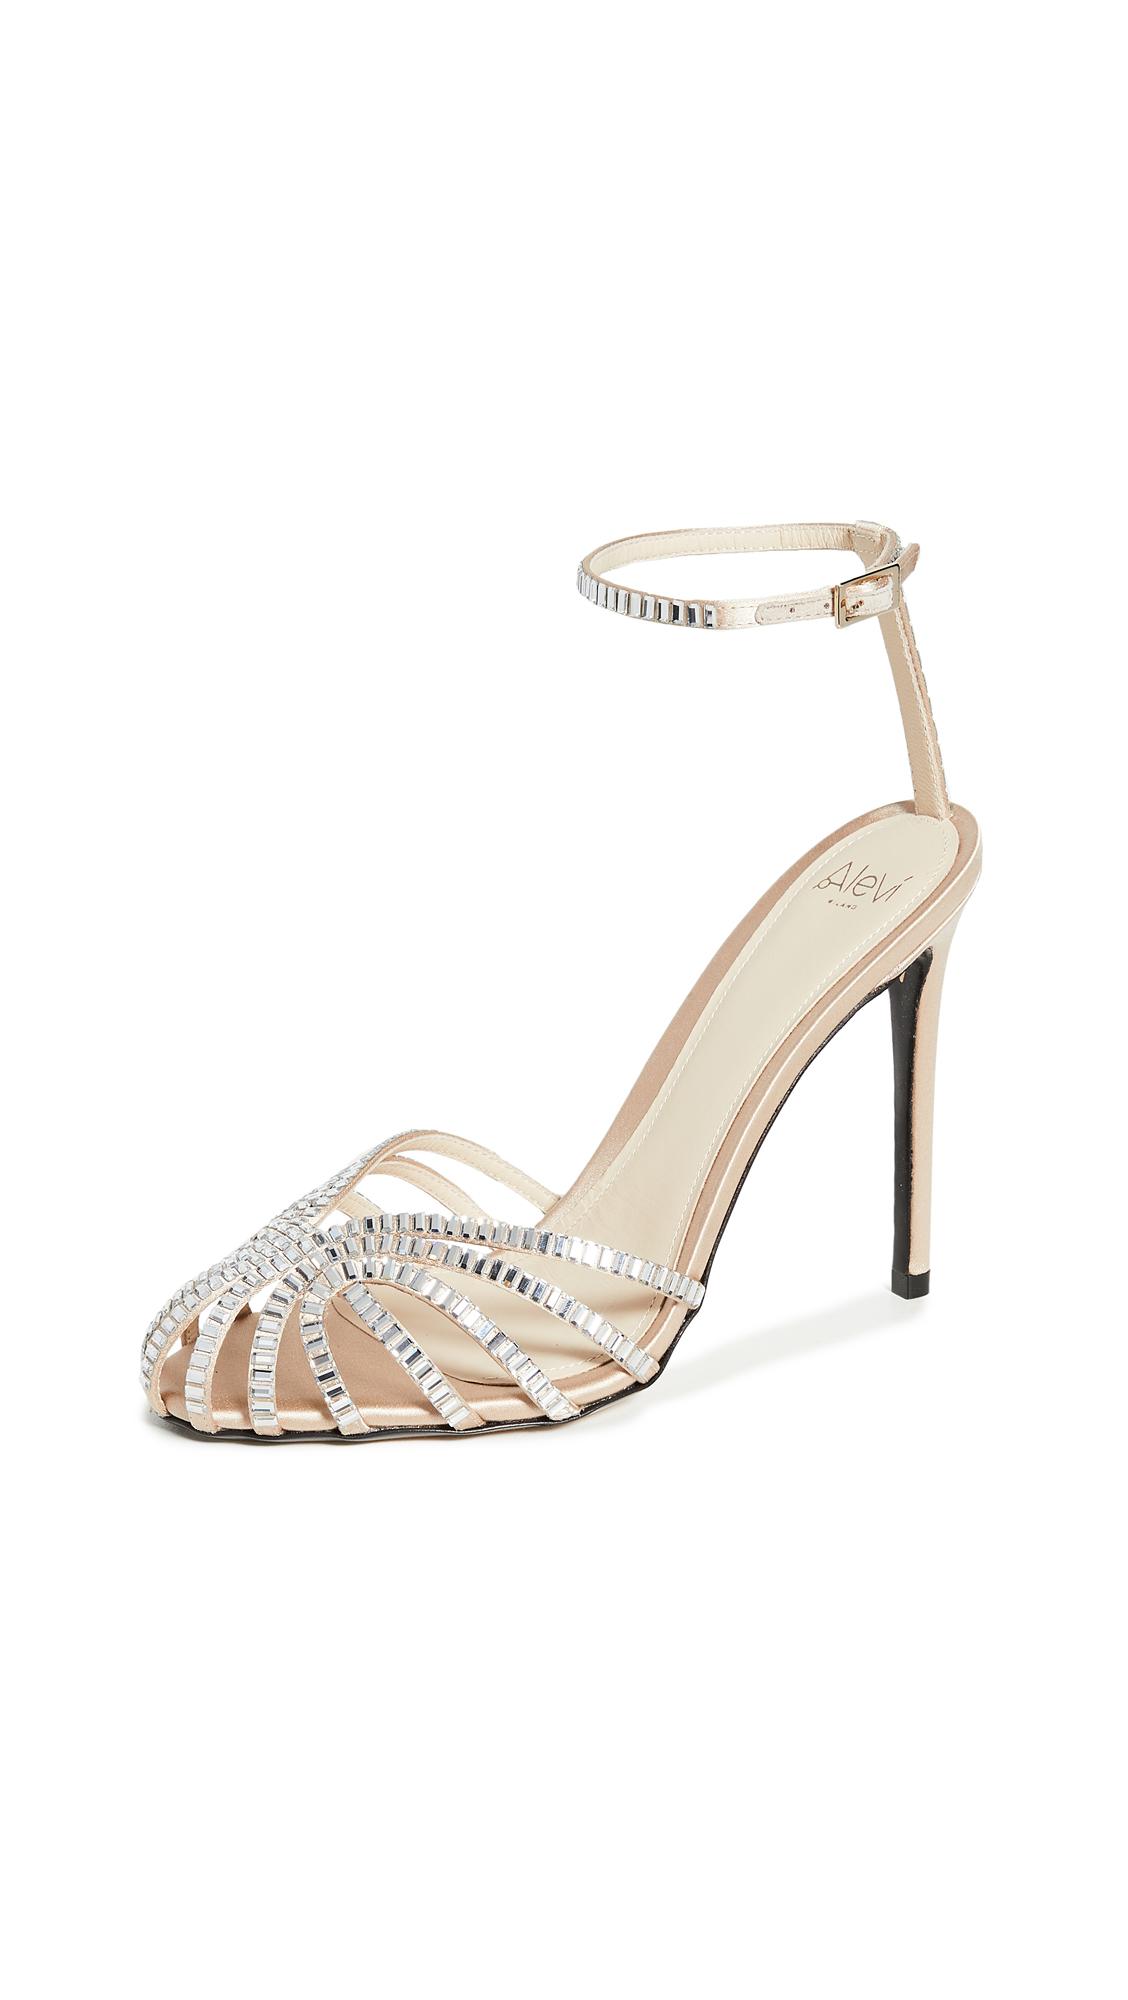 Buy Alevi Milano Penelope Sandals online, shop Alevi Milano